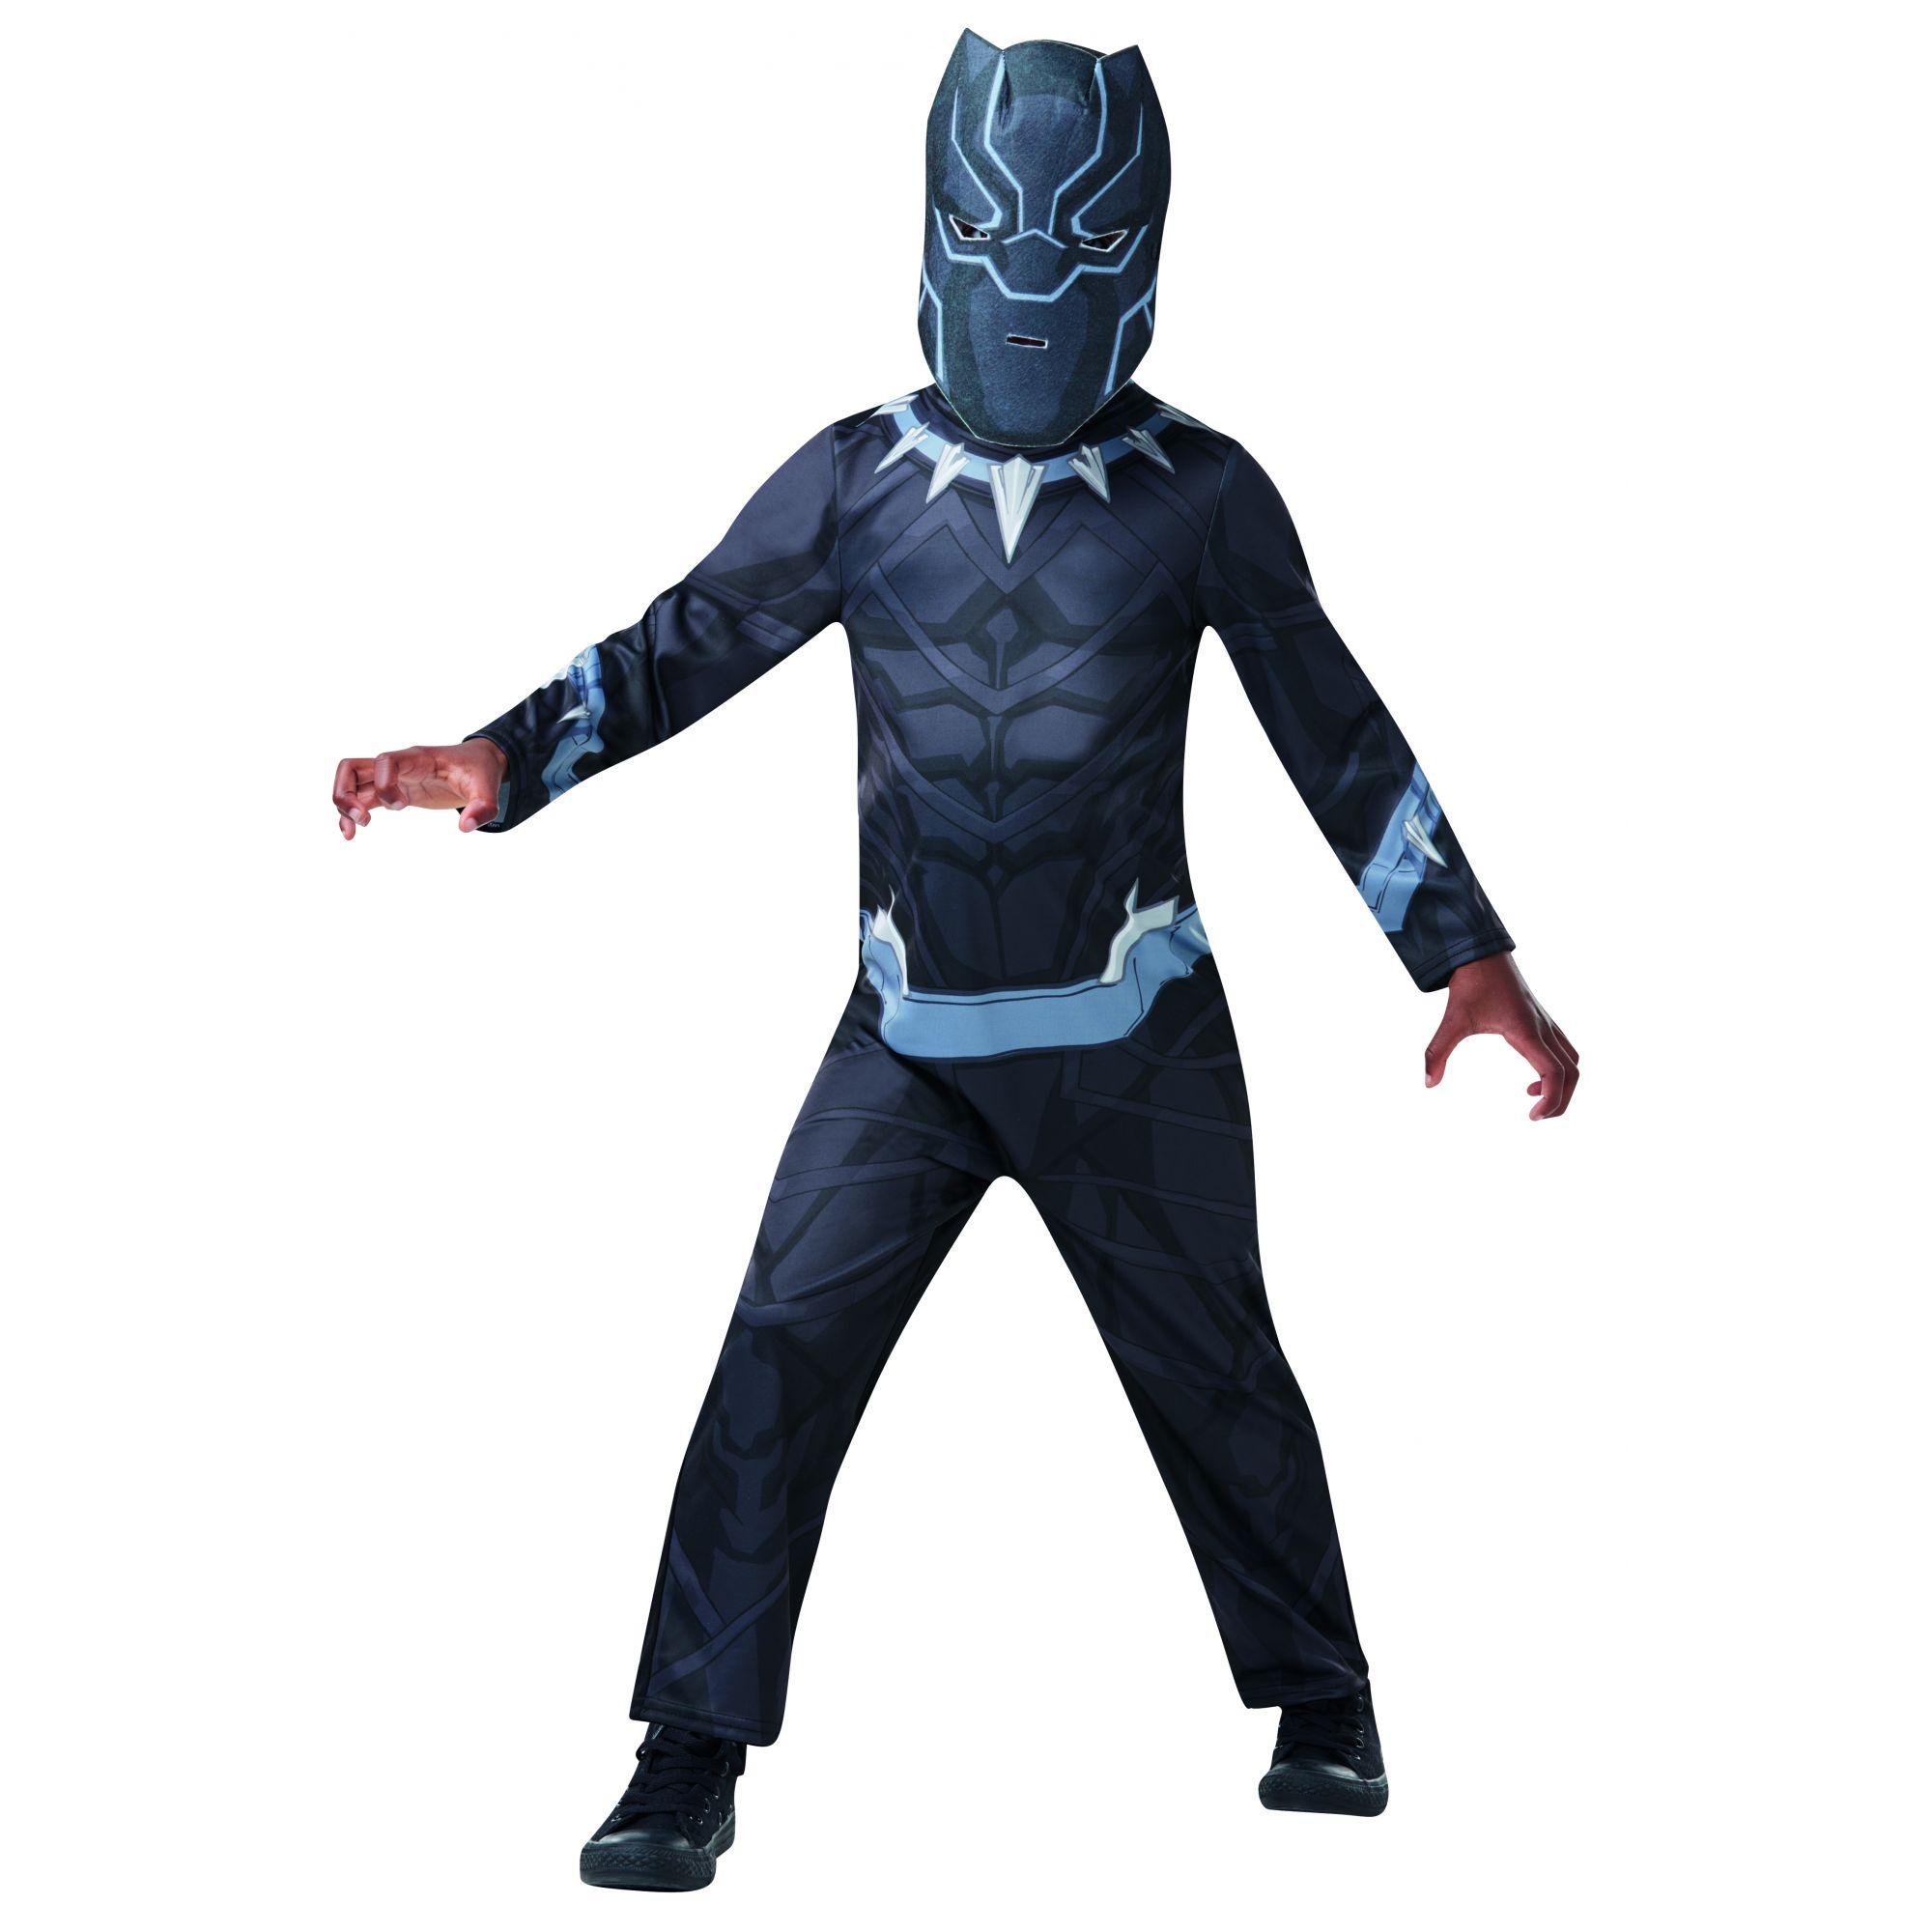 Costume Avengers Black Panther bambino 3/4 anni